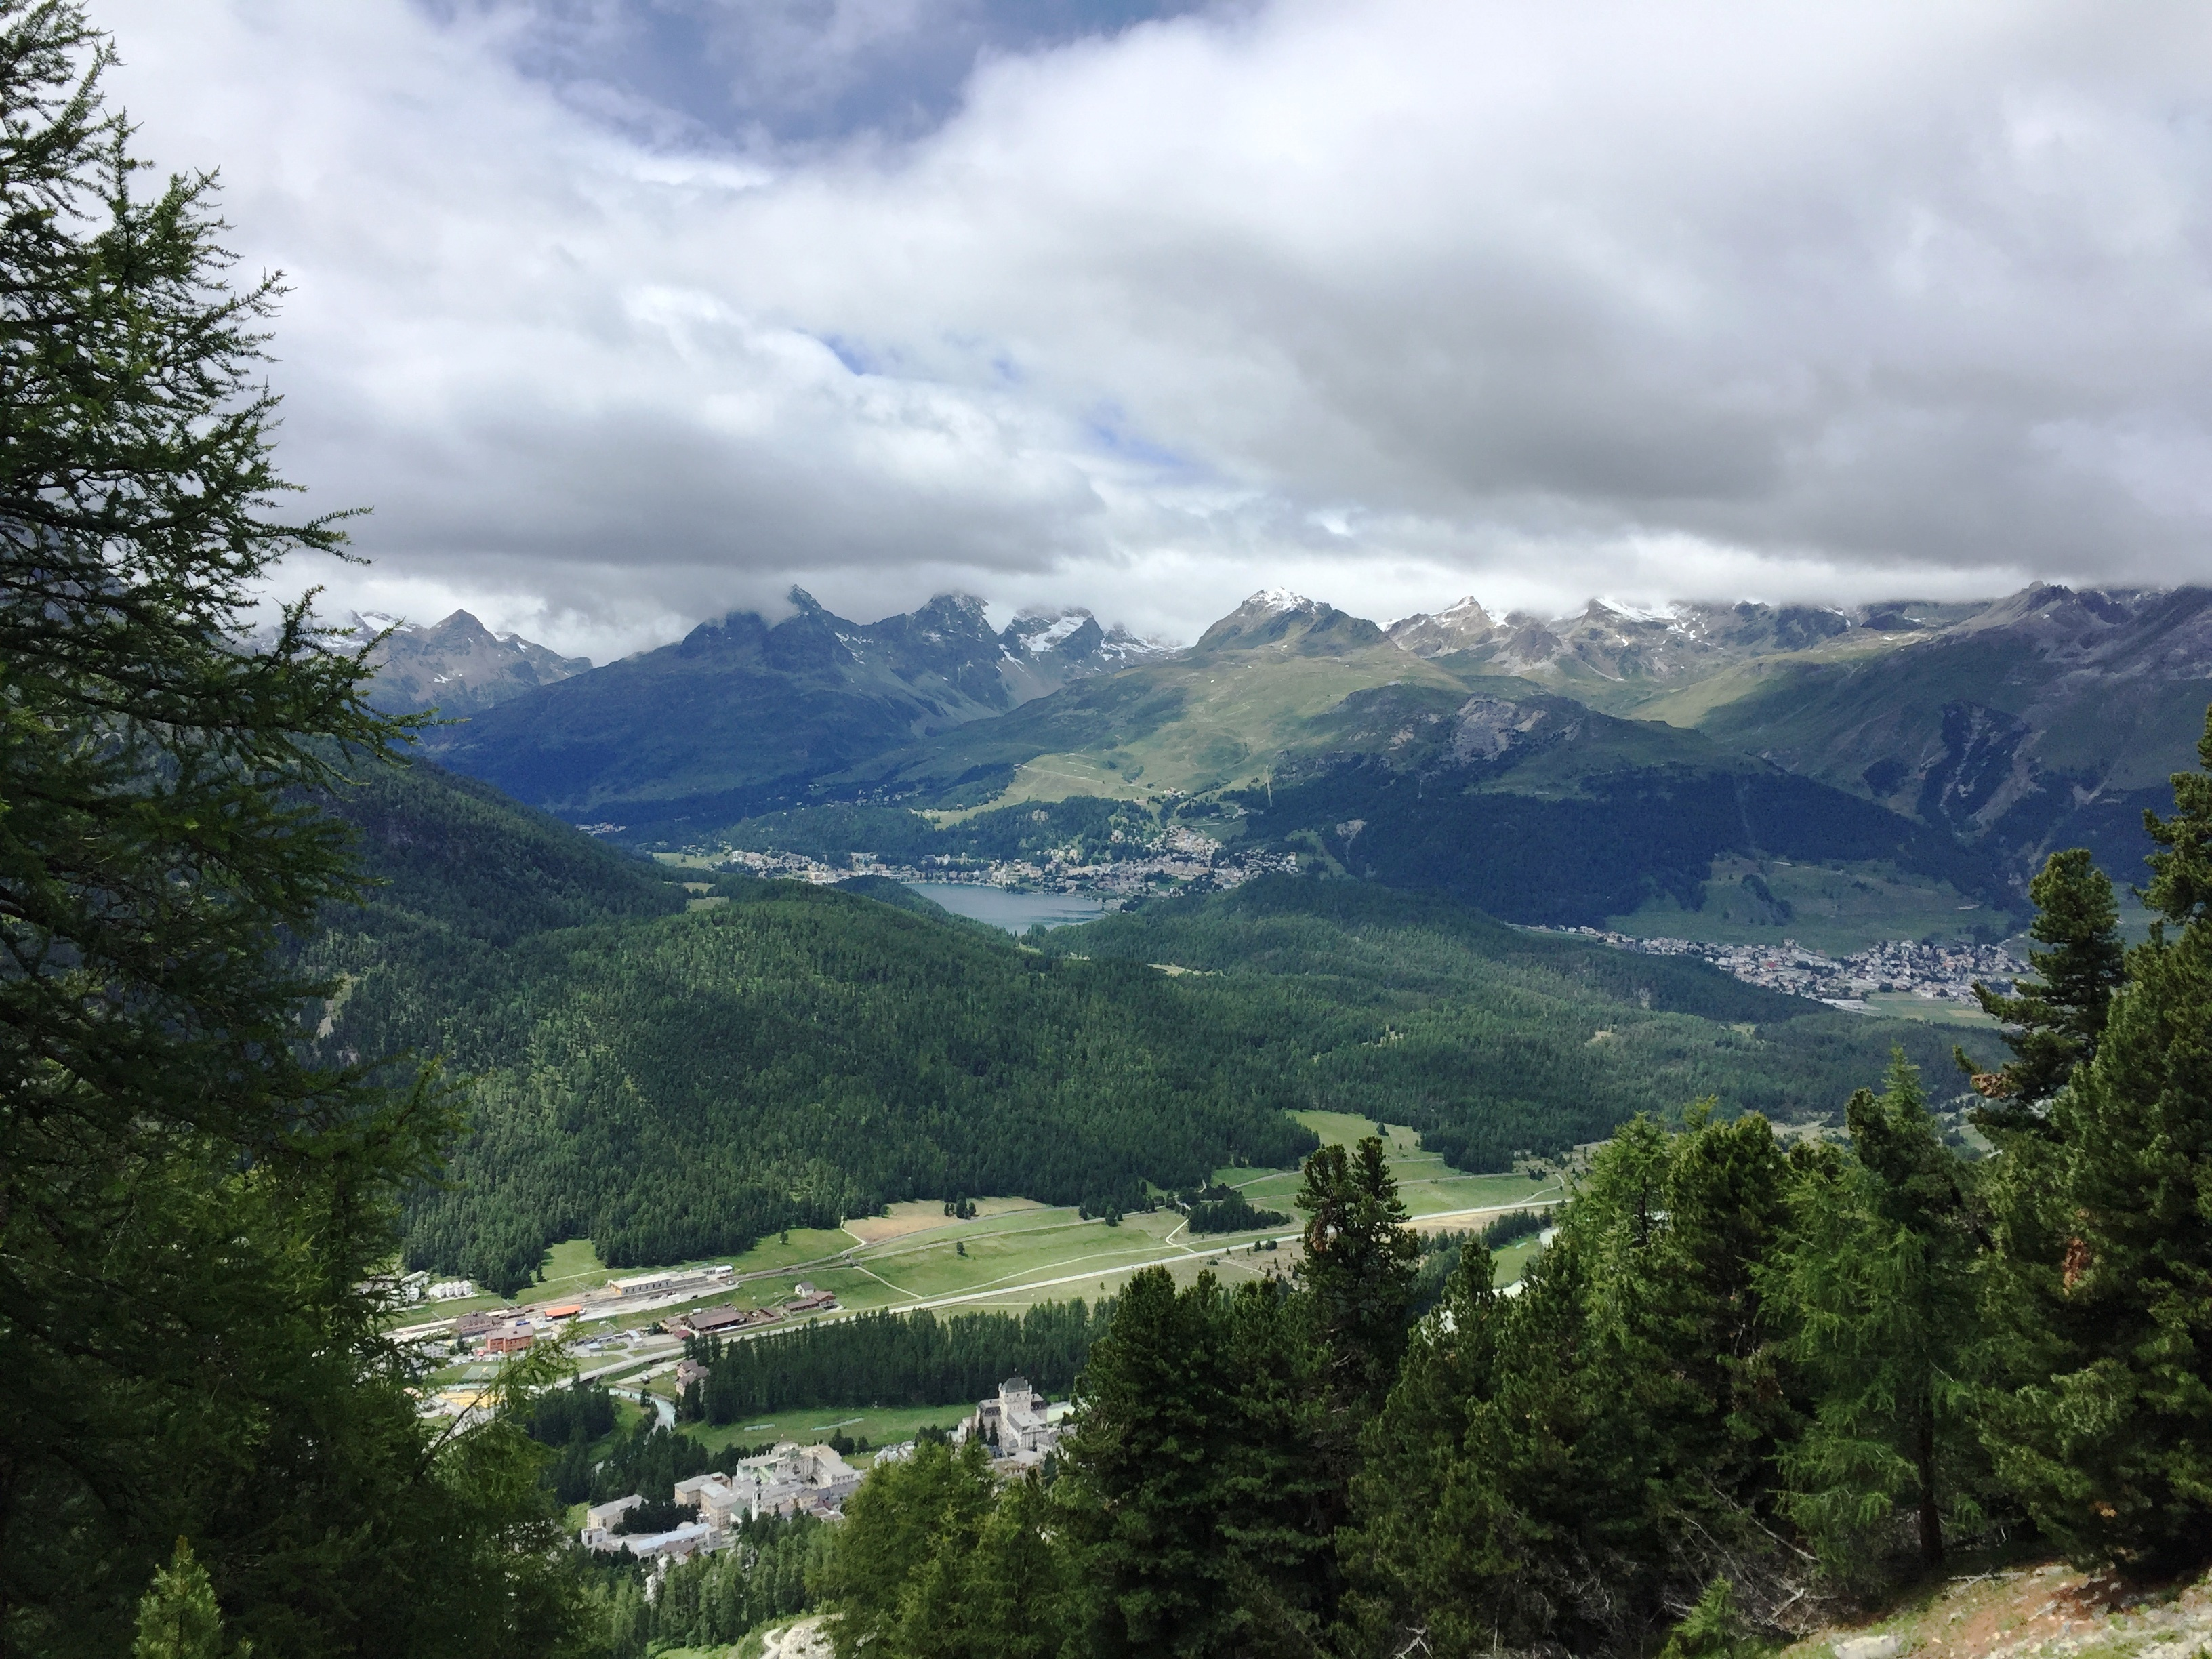 Sitzbänke Panoramaweg Muottas-Muragl - Alp Languard Slide 10